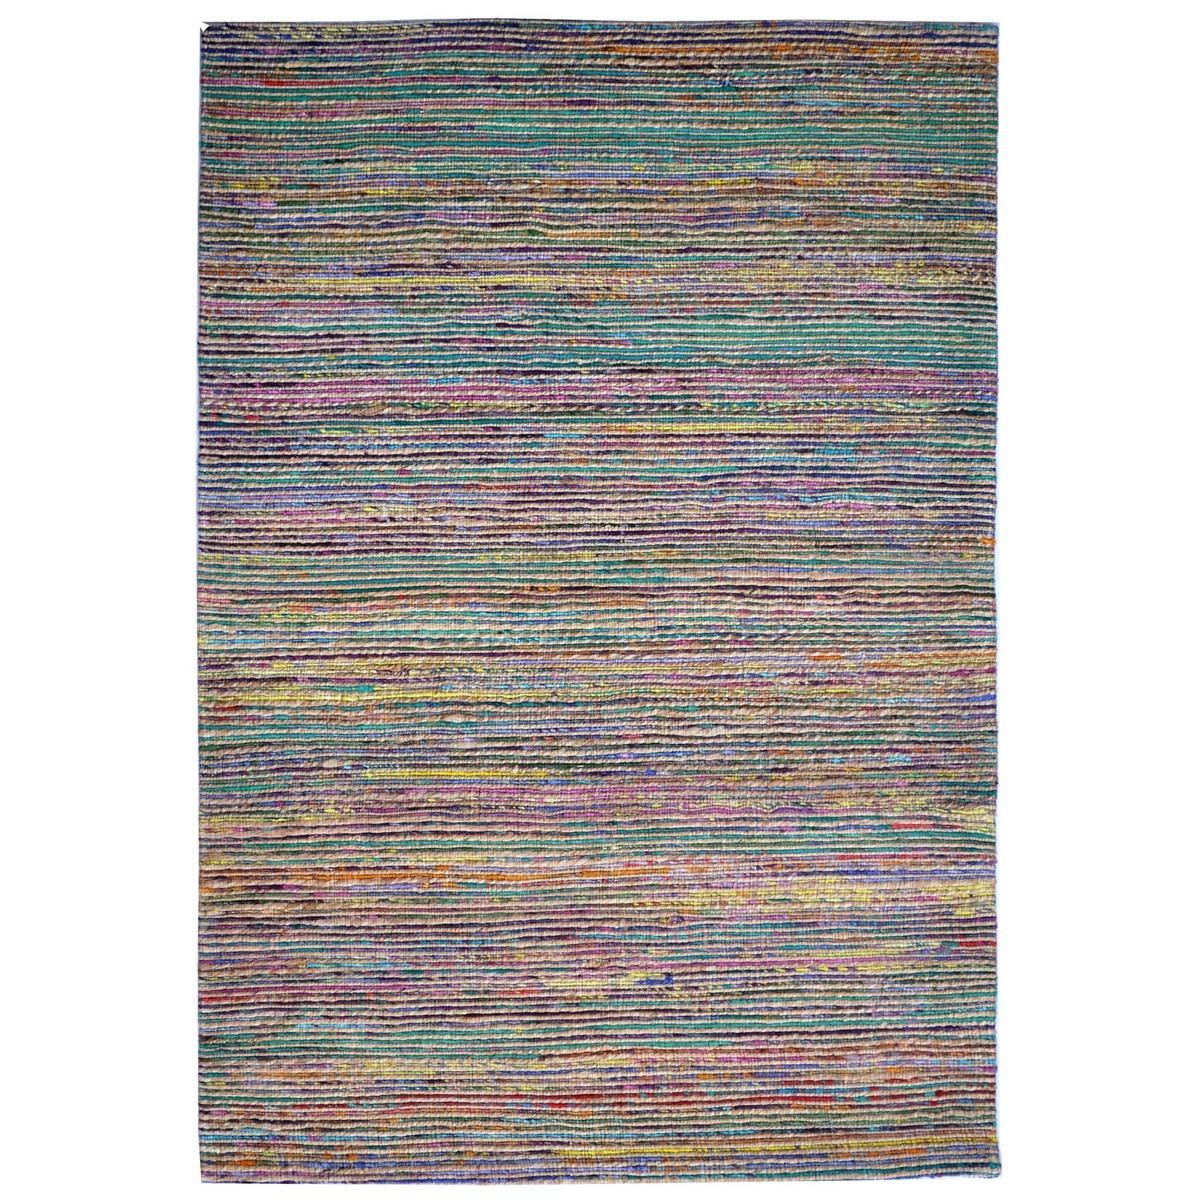 Kerla Horizon Handwoven Silk & Jute Rug, 230x160cm, Natural / Multi